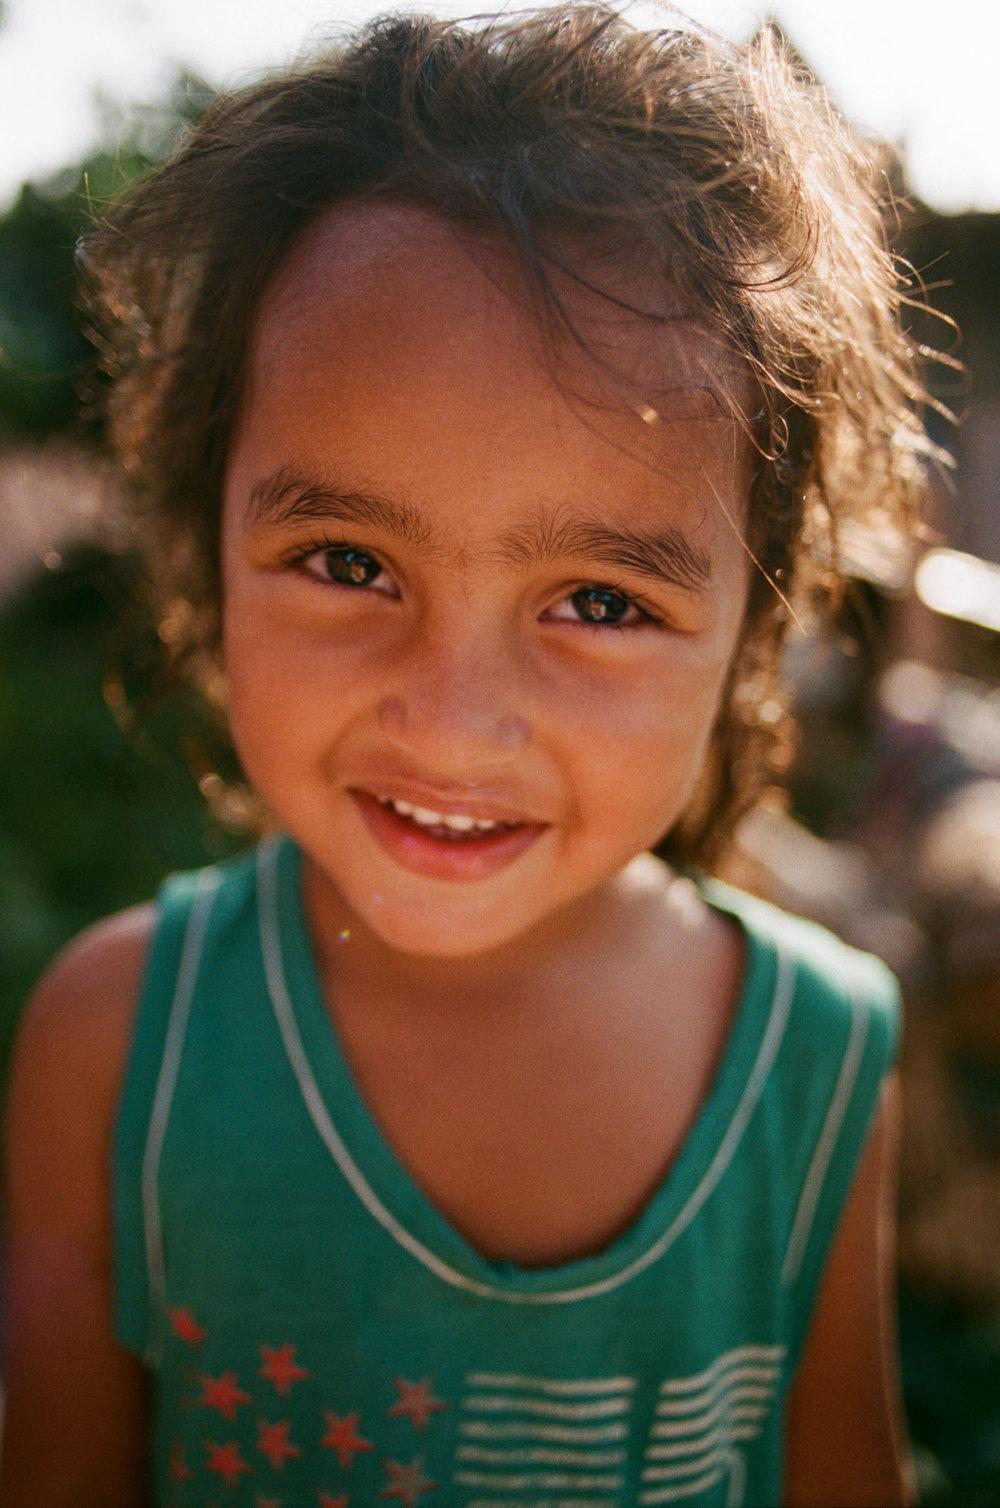 21392_JRE_Nepal_008-22site.jpg